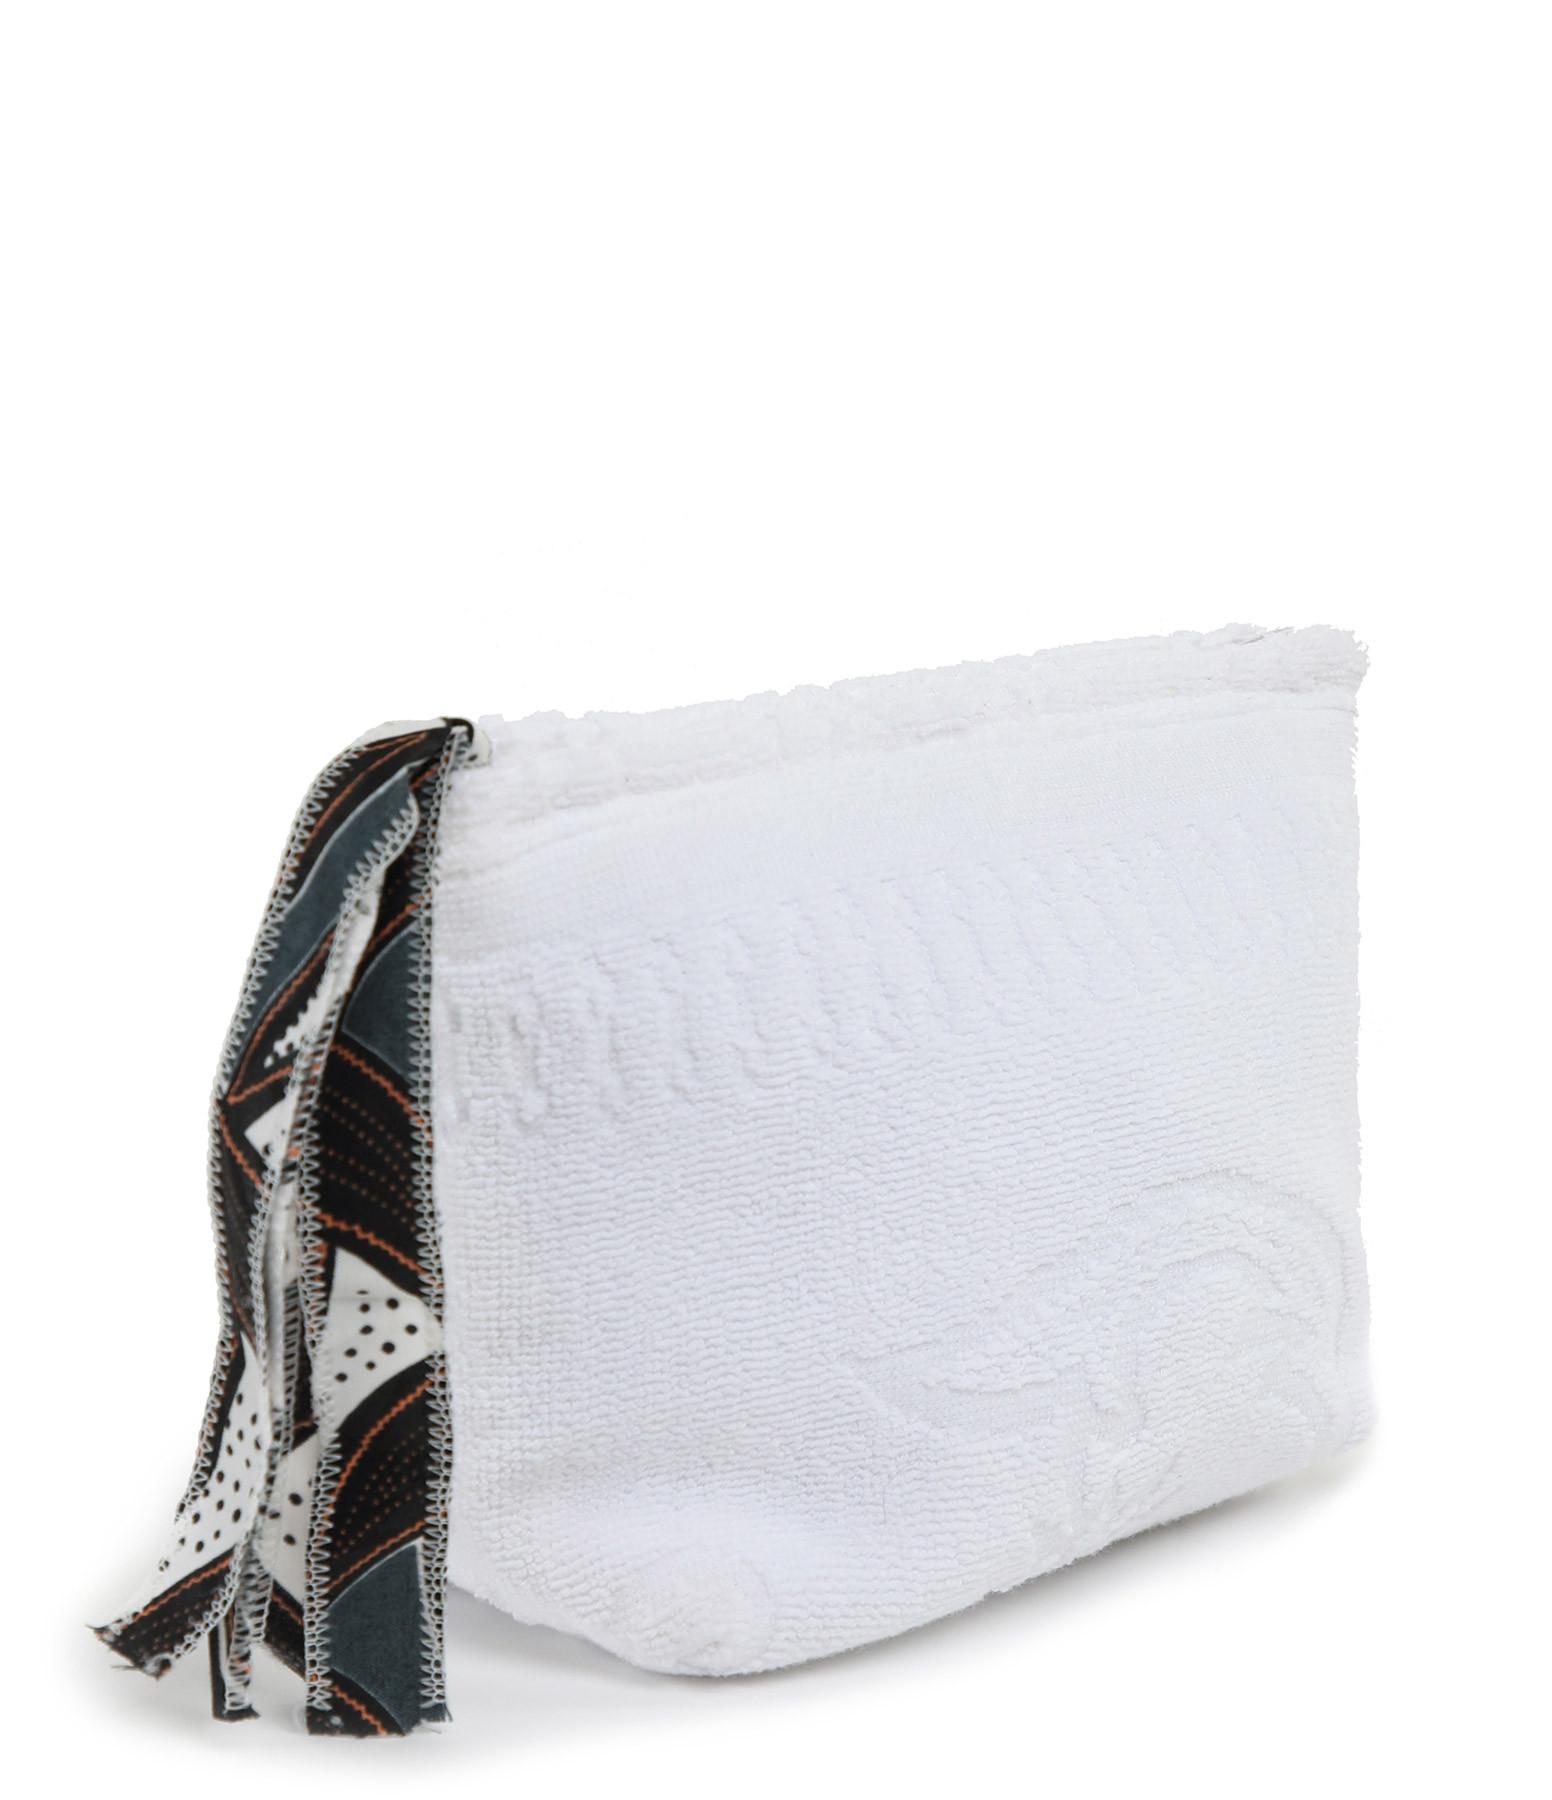 LALLA - Petite Trousse Walakin Éponge Blanc